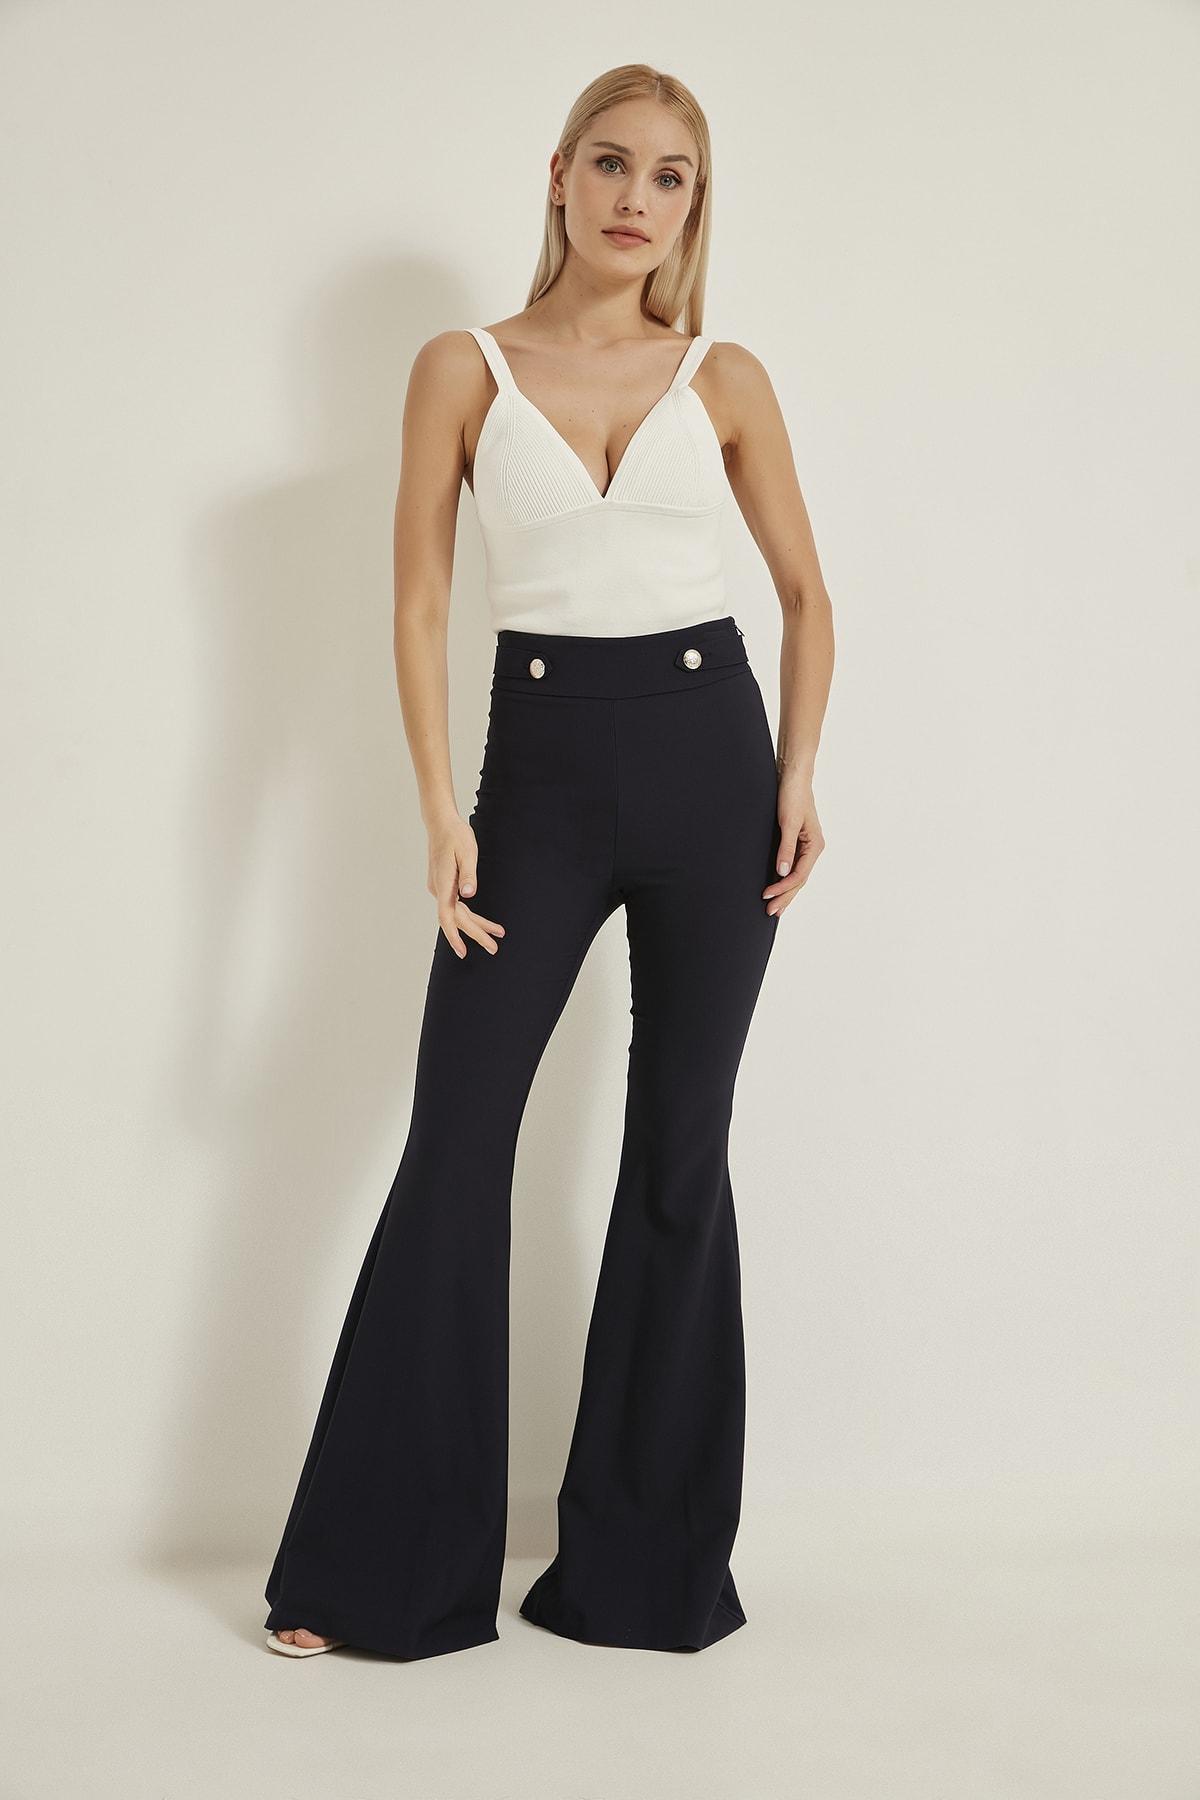 LA COSTUME Kadın Lacivert Ispanyol Paça Pantolon 2